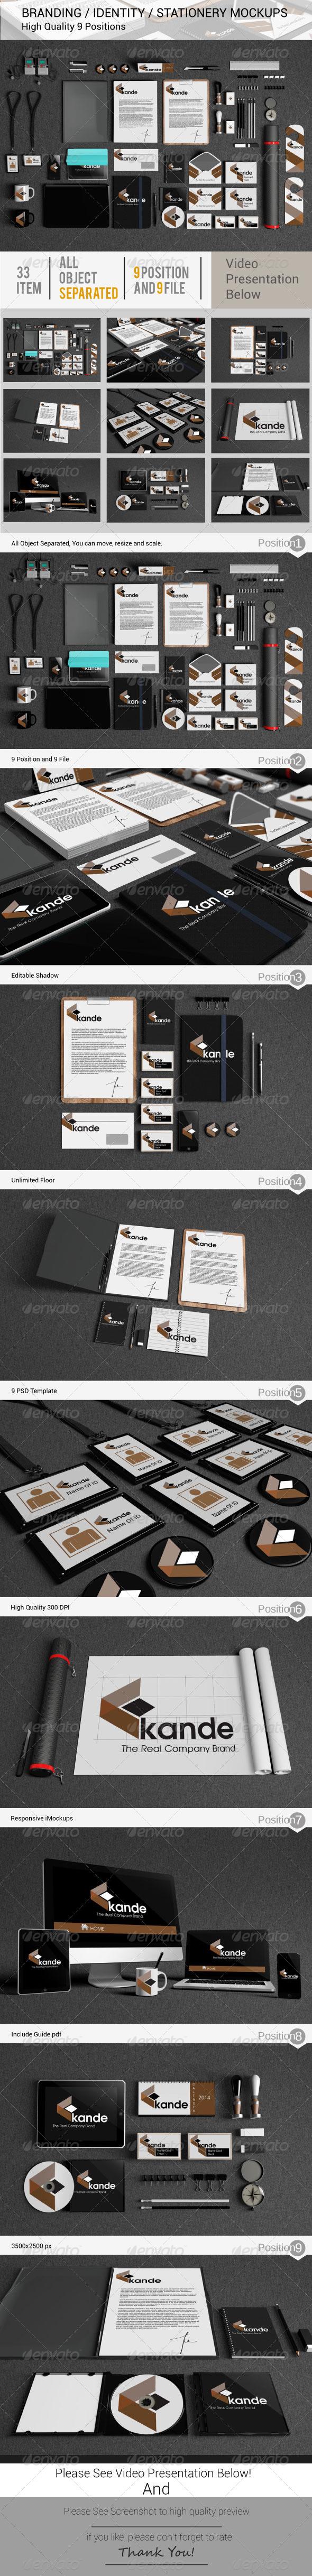 GraphicRiver Branding Identity Stationery Mockups 5249604